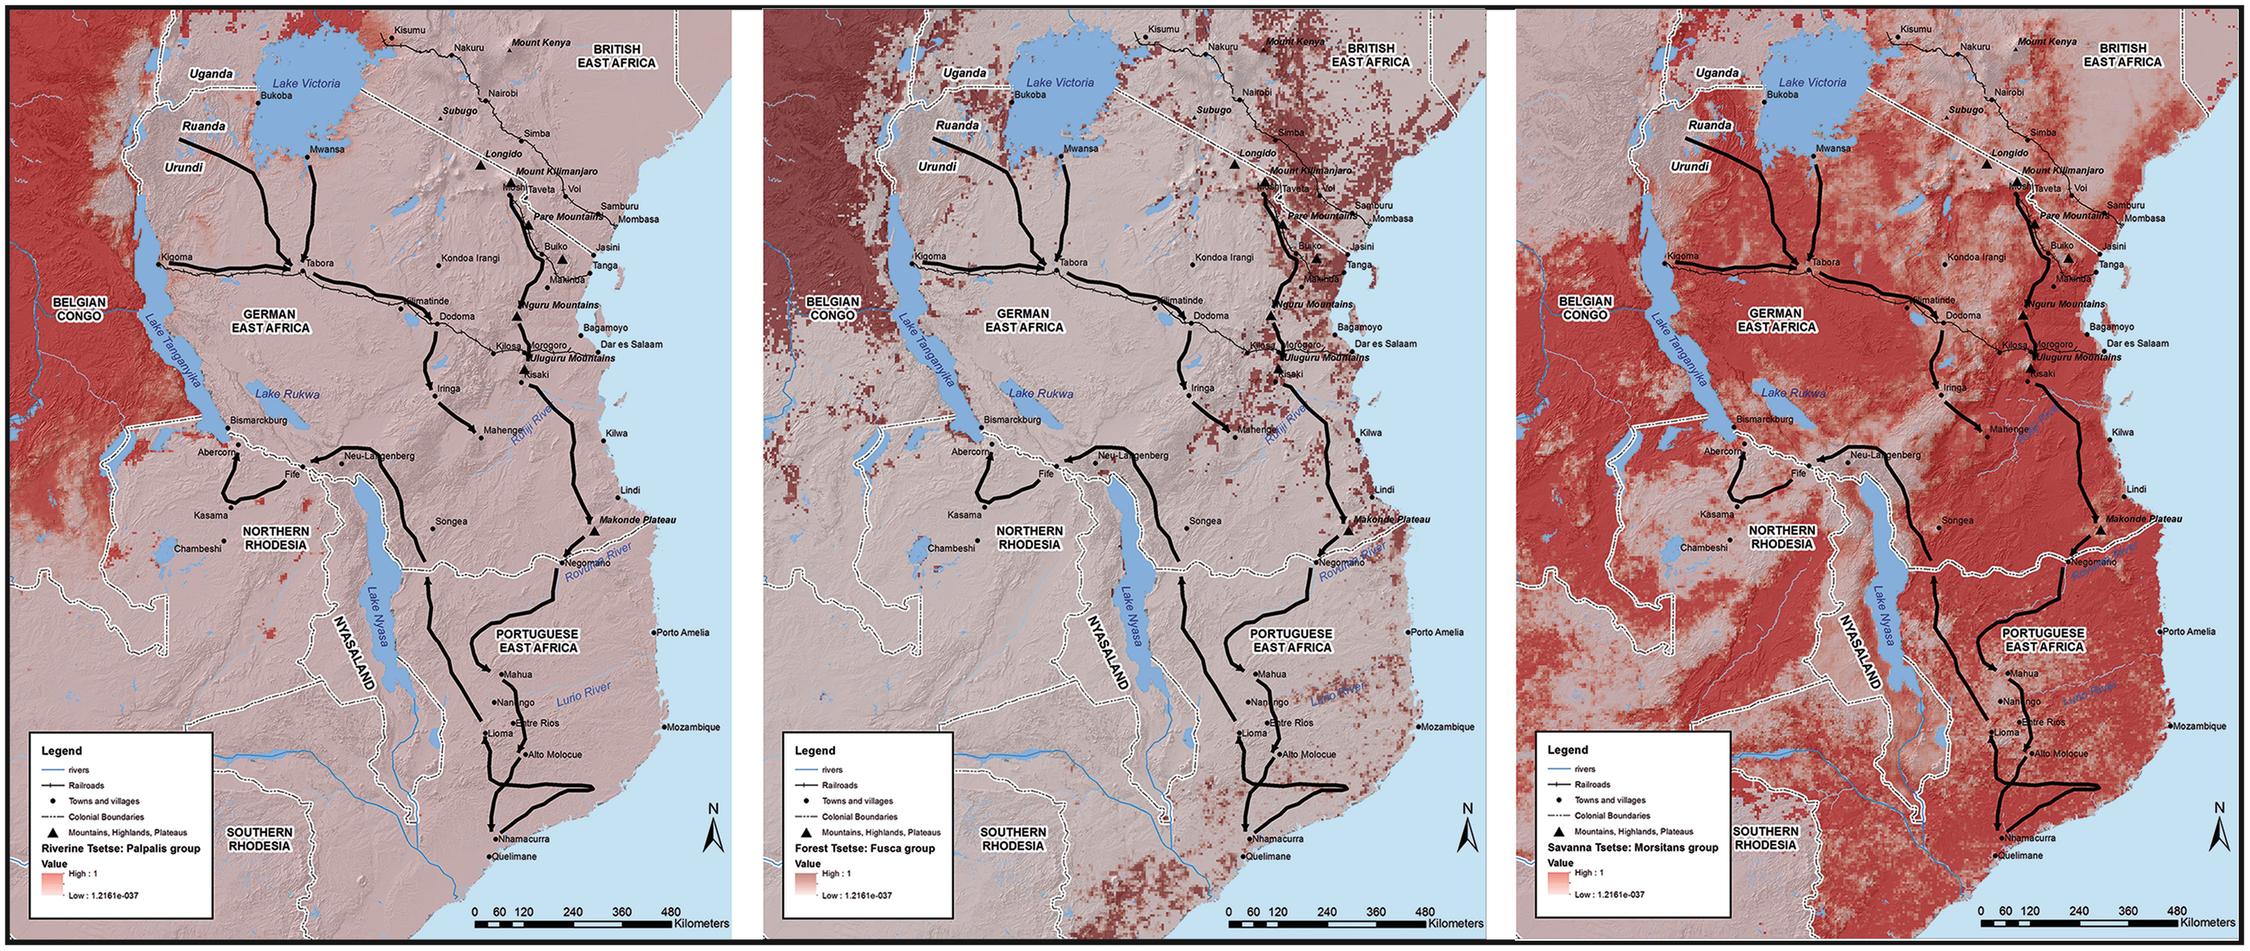 East africa in world war i a geographic analysis springerlink open image in new window fandeluxe Gallery